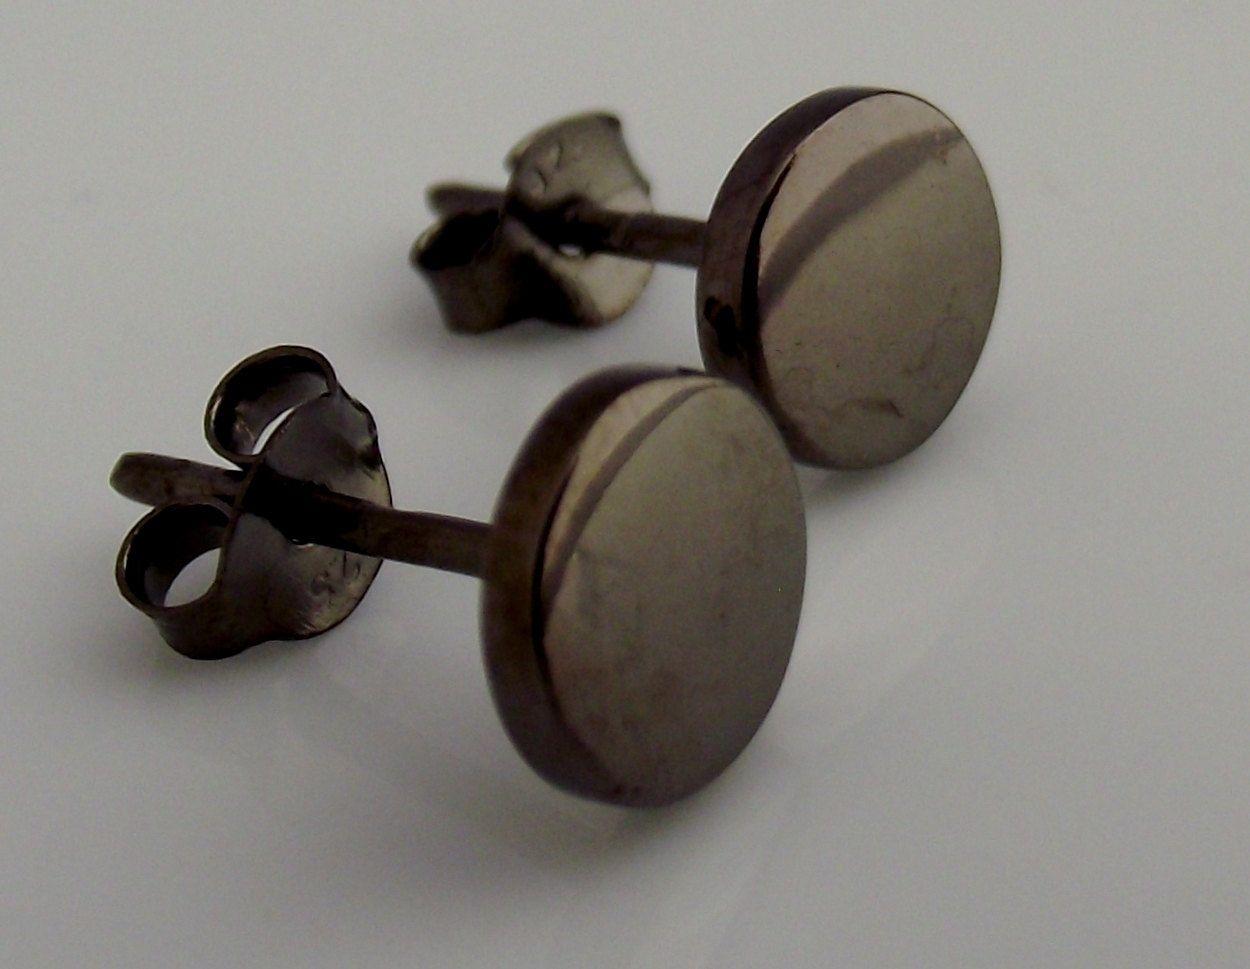 Mens Earrings Black Stud Earrings For Men Nail